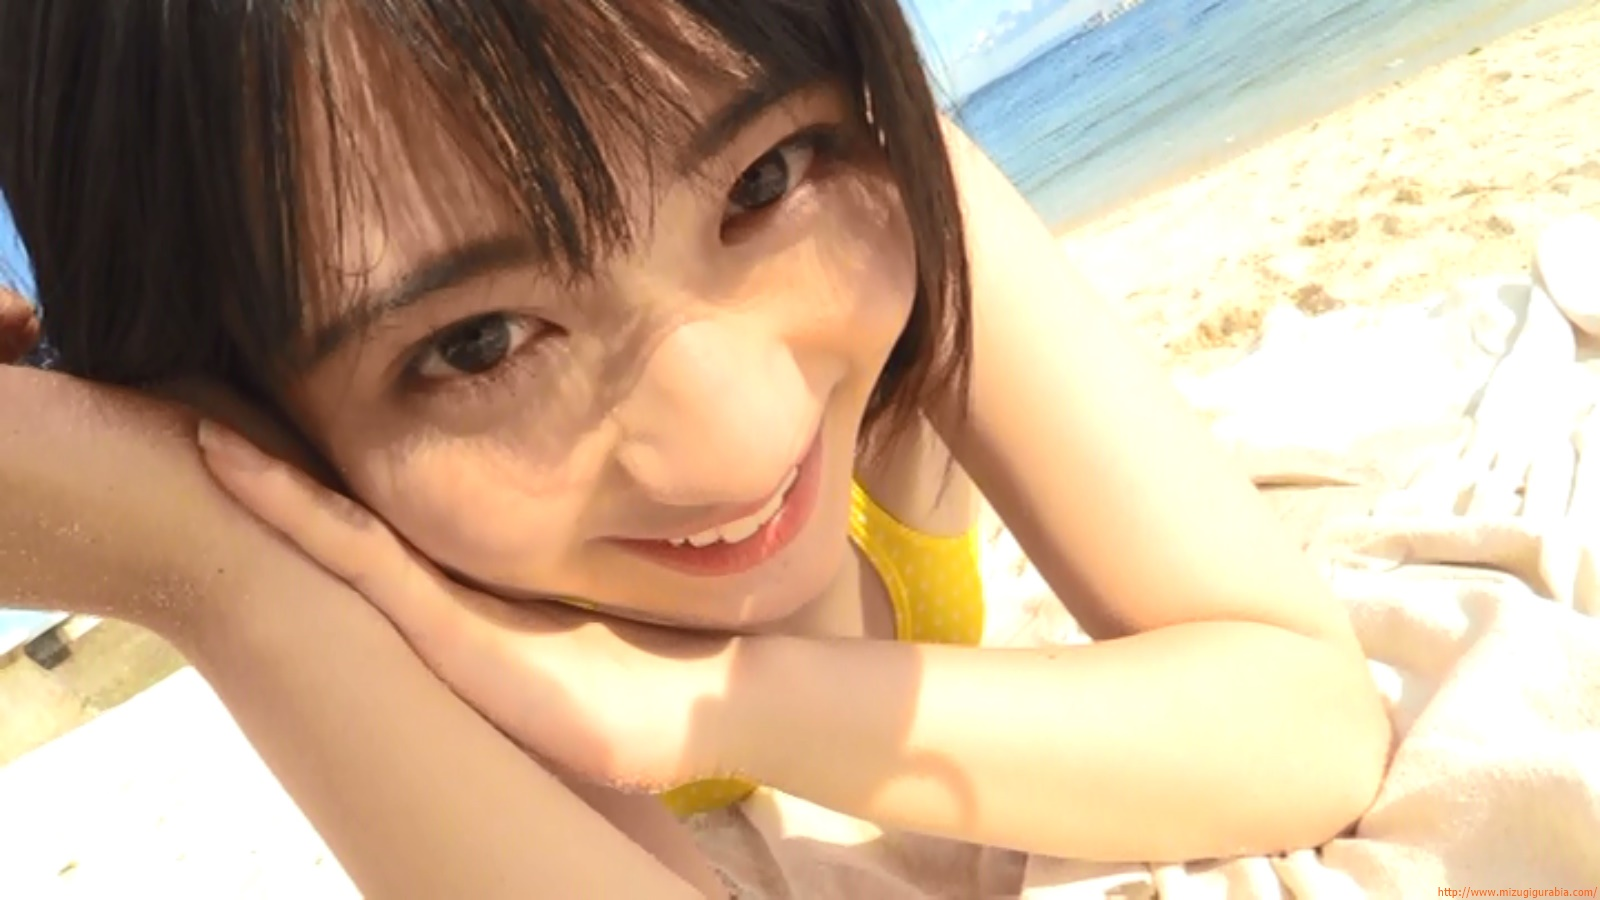 Beach dating428